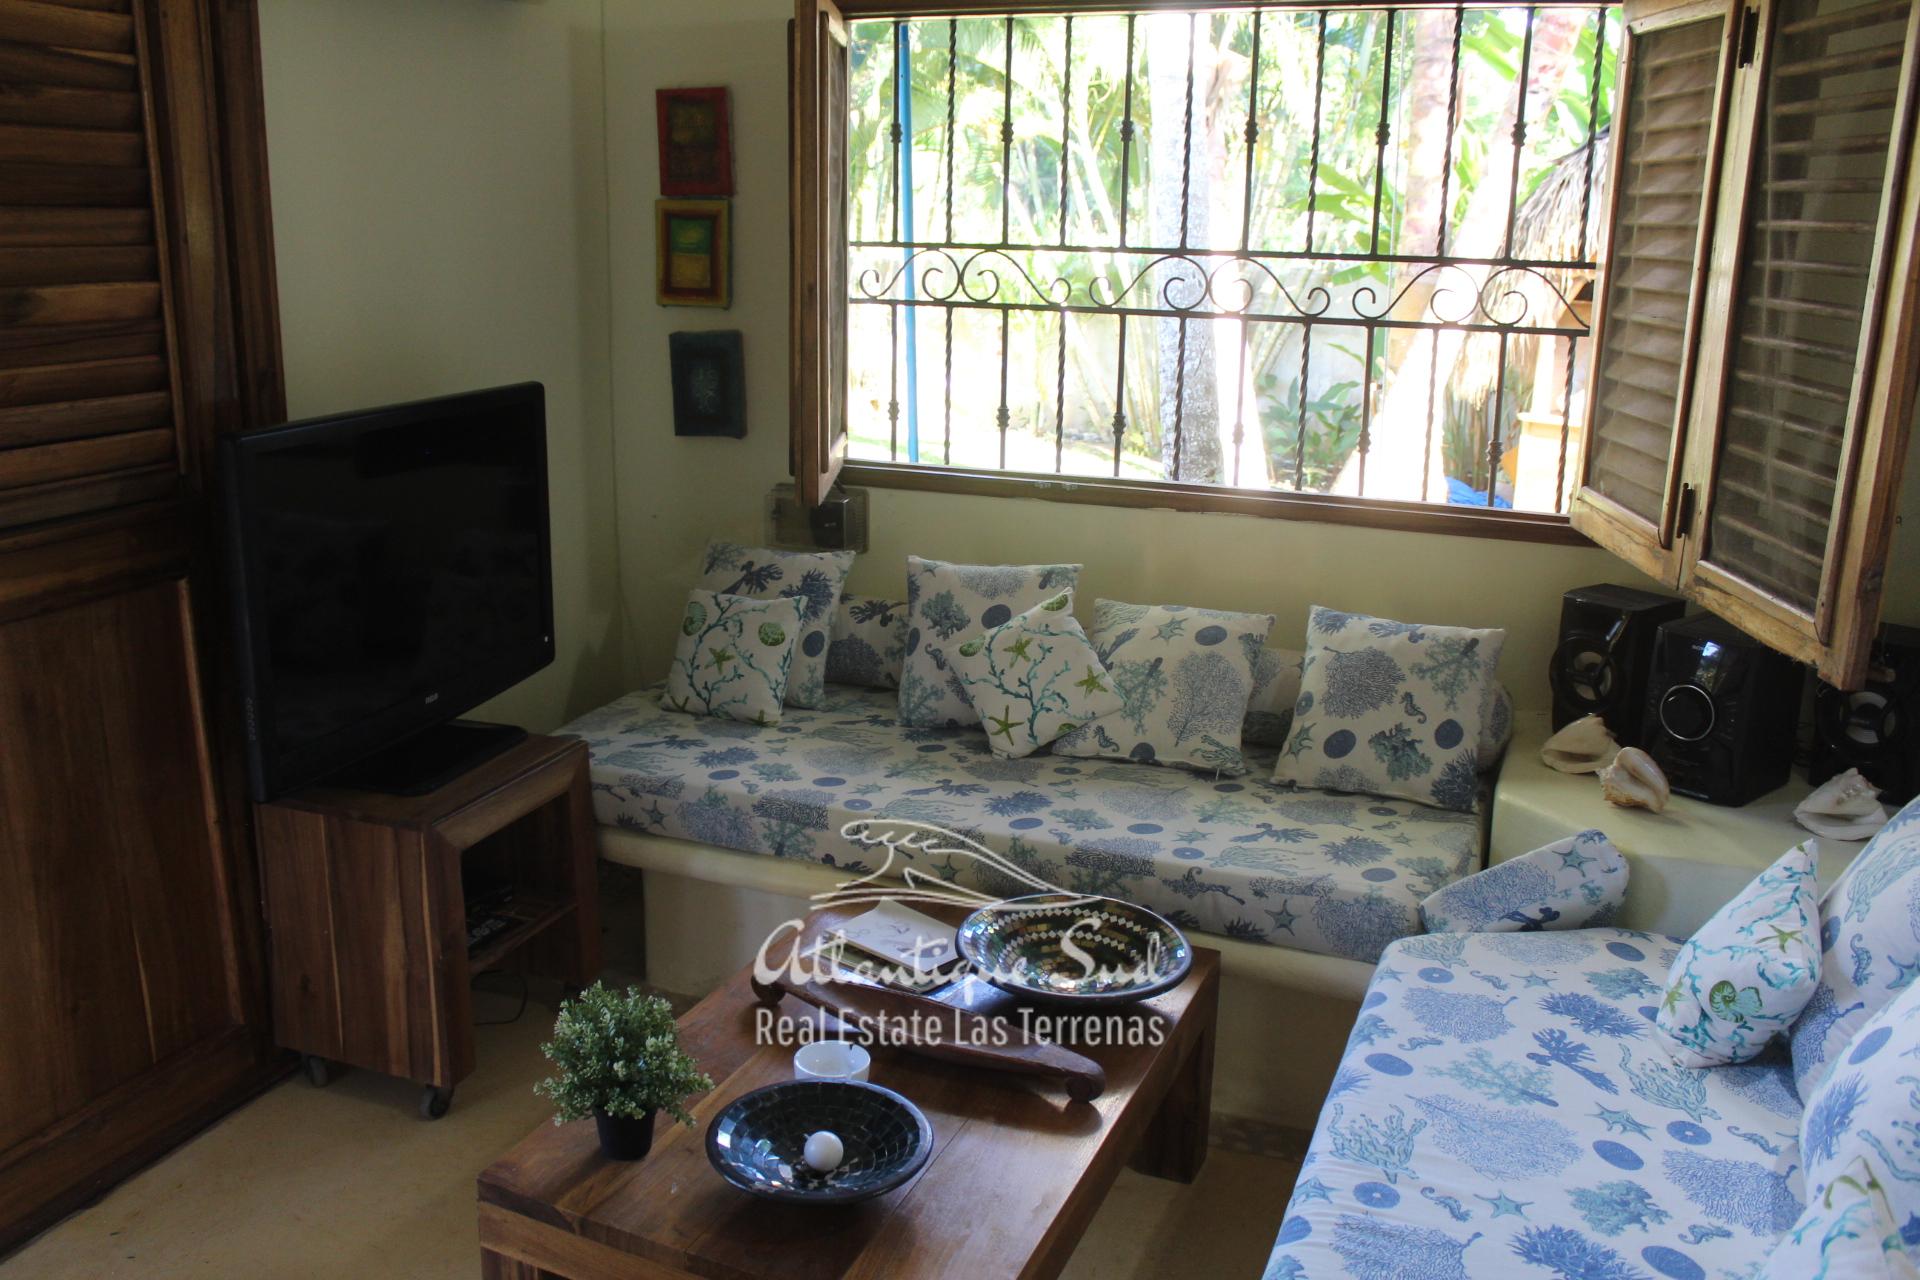 2 carribean villas minutes to the beach Real Estate Las Terrenas Dominican Republic Atlantique Sud6.jpg